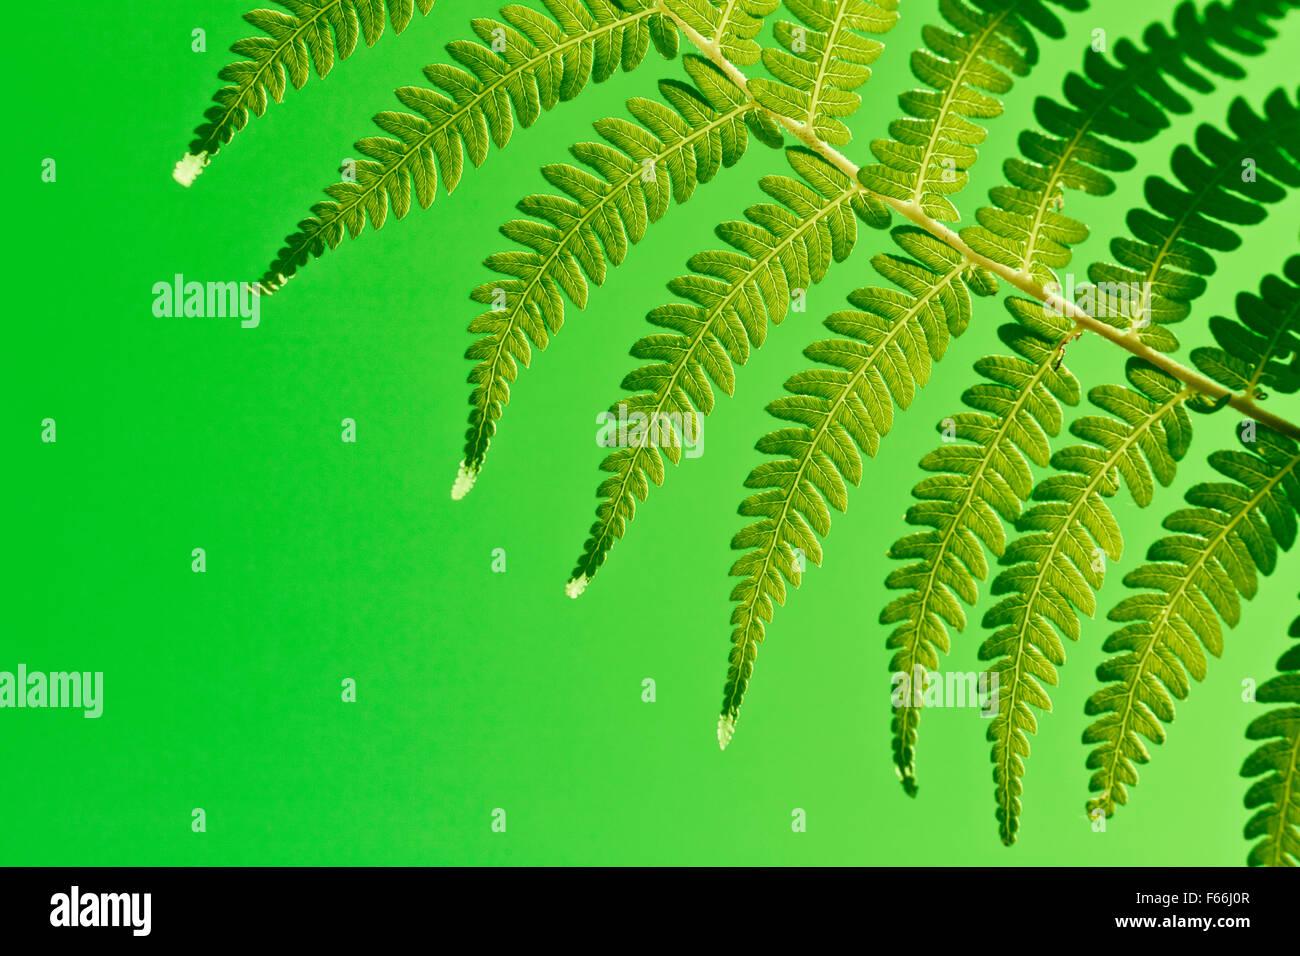 Verde fresco fondos de helecho de Nueva Zelanda Imagen De Stock